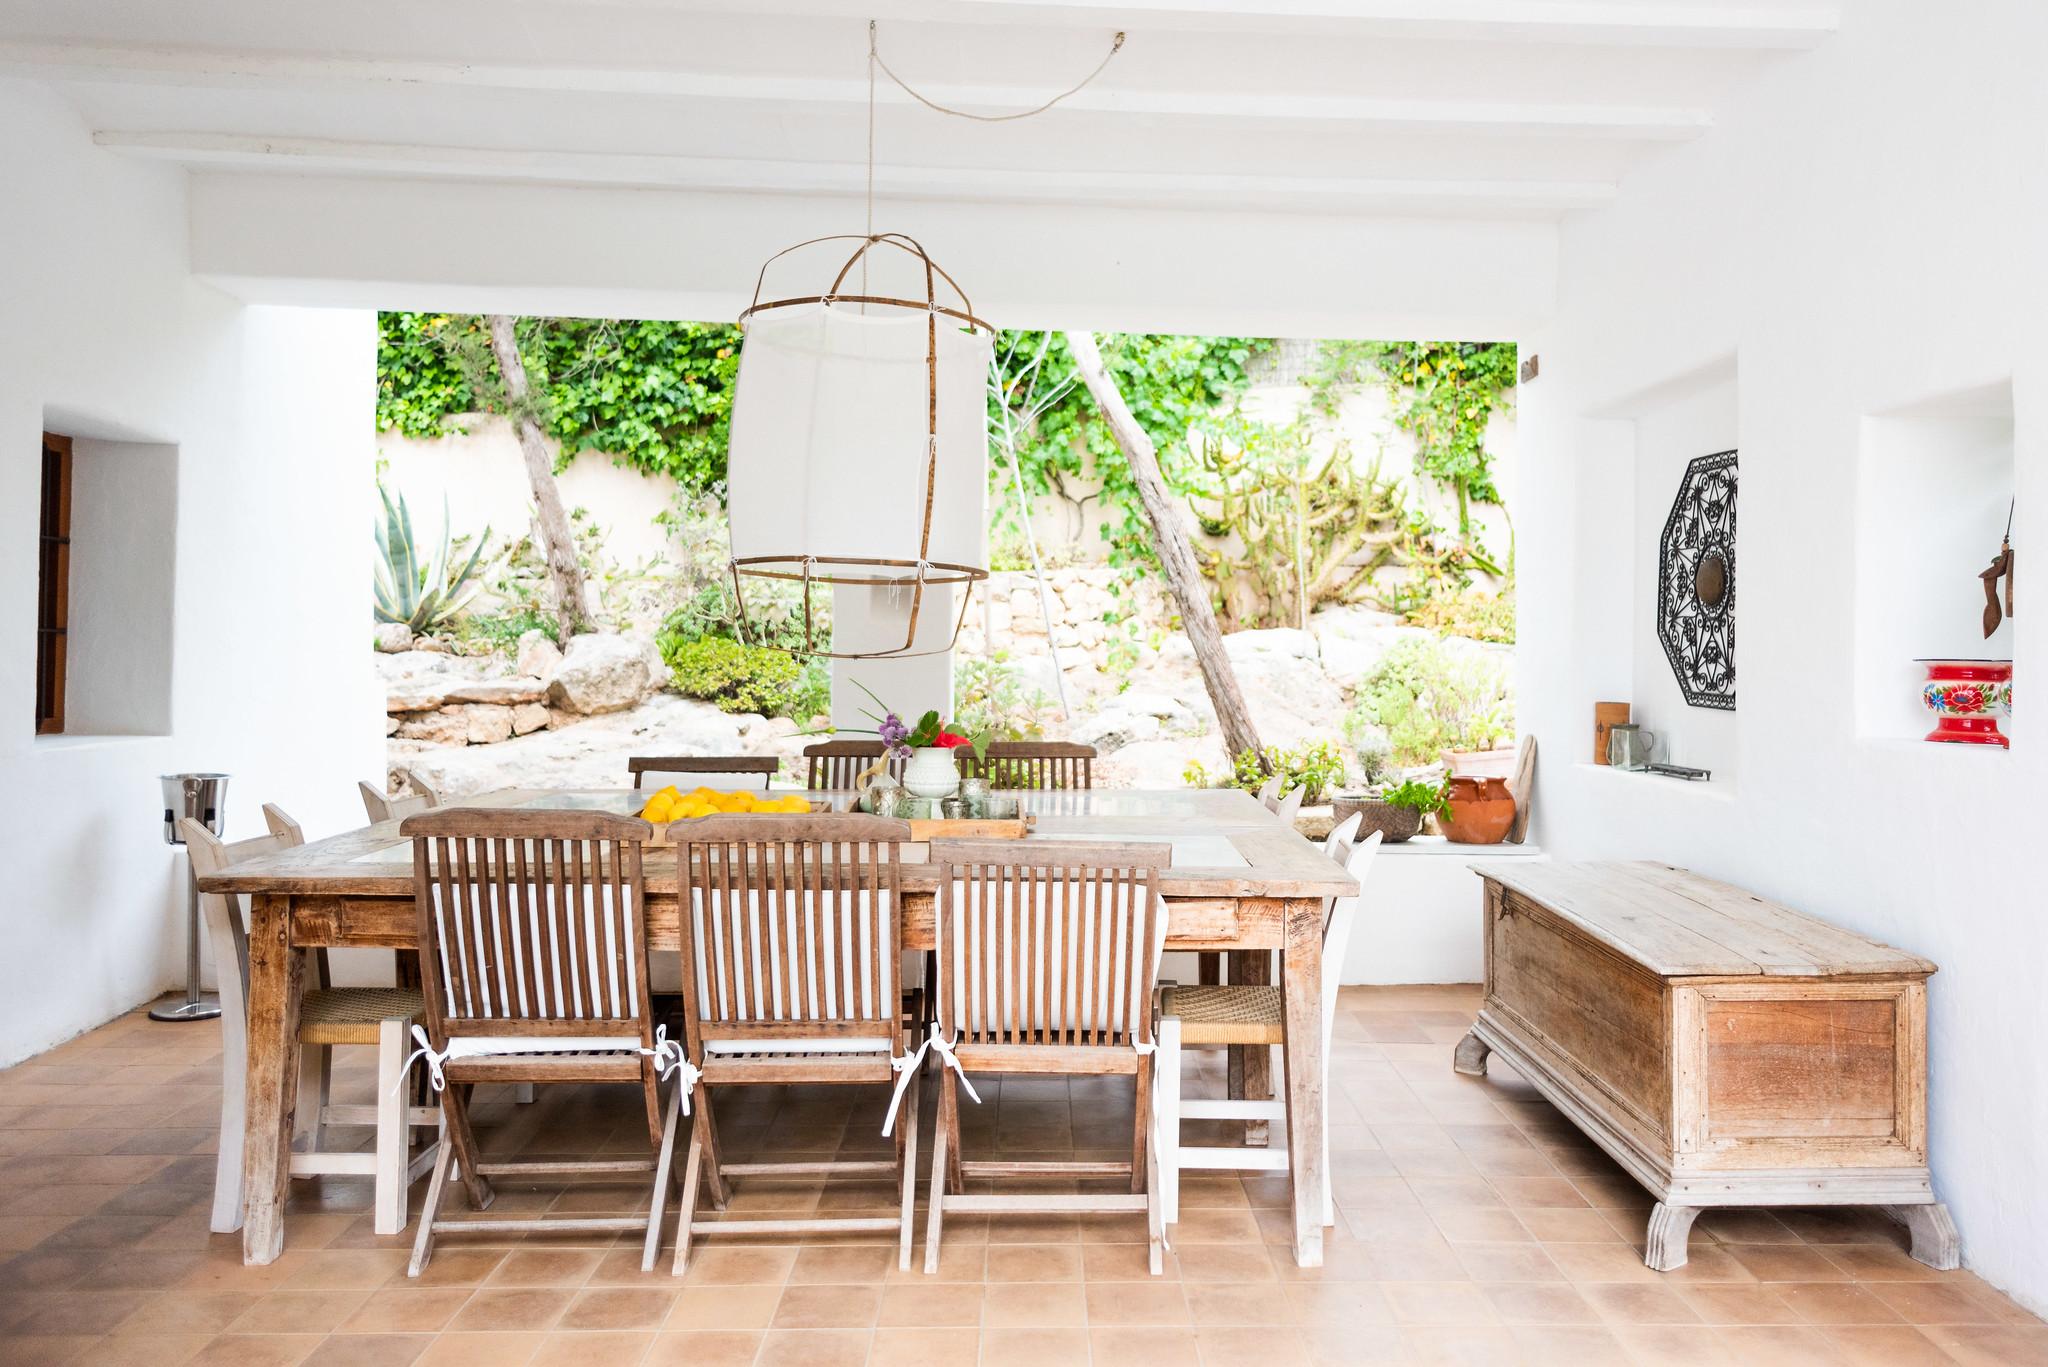 https://www.white-ibiza.com/wp-content/uploads/2020/05/white-ibiza-villas-can-lyra-exterior-dining.jpg